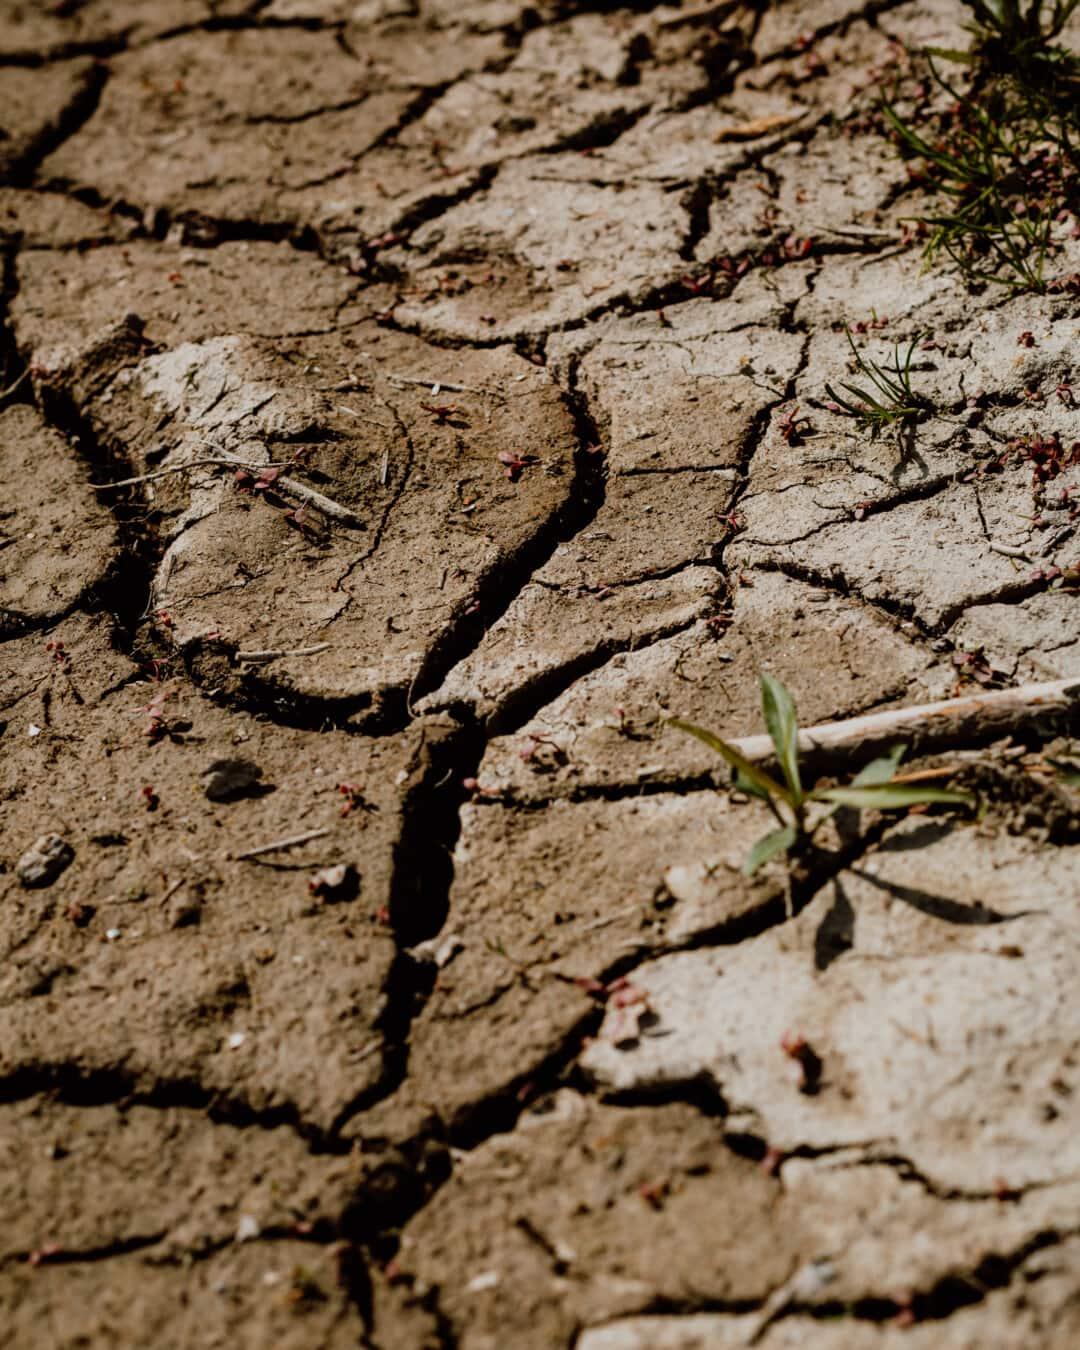 earth, dry season, dry, summer season, soil, wasteland, mud, drought, terrain, erosion